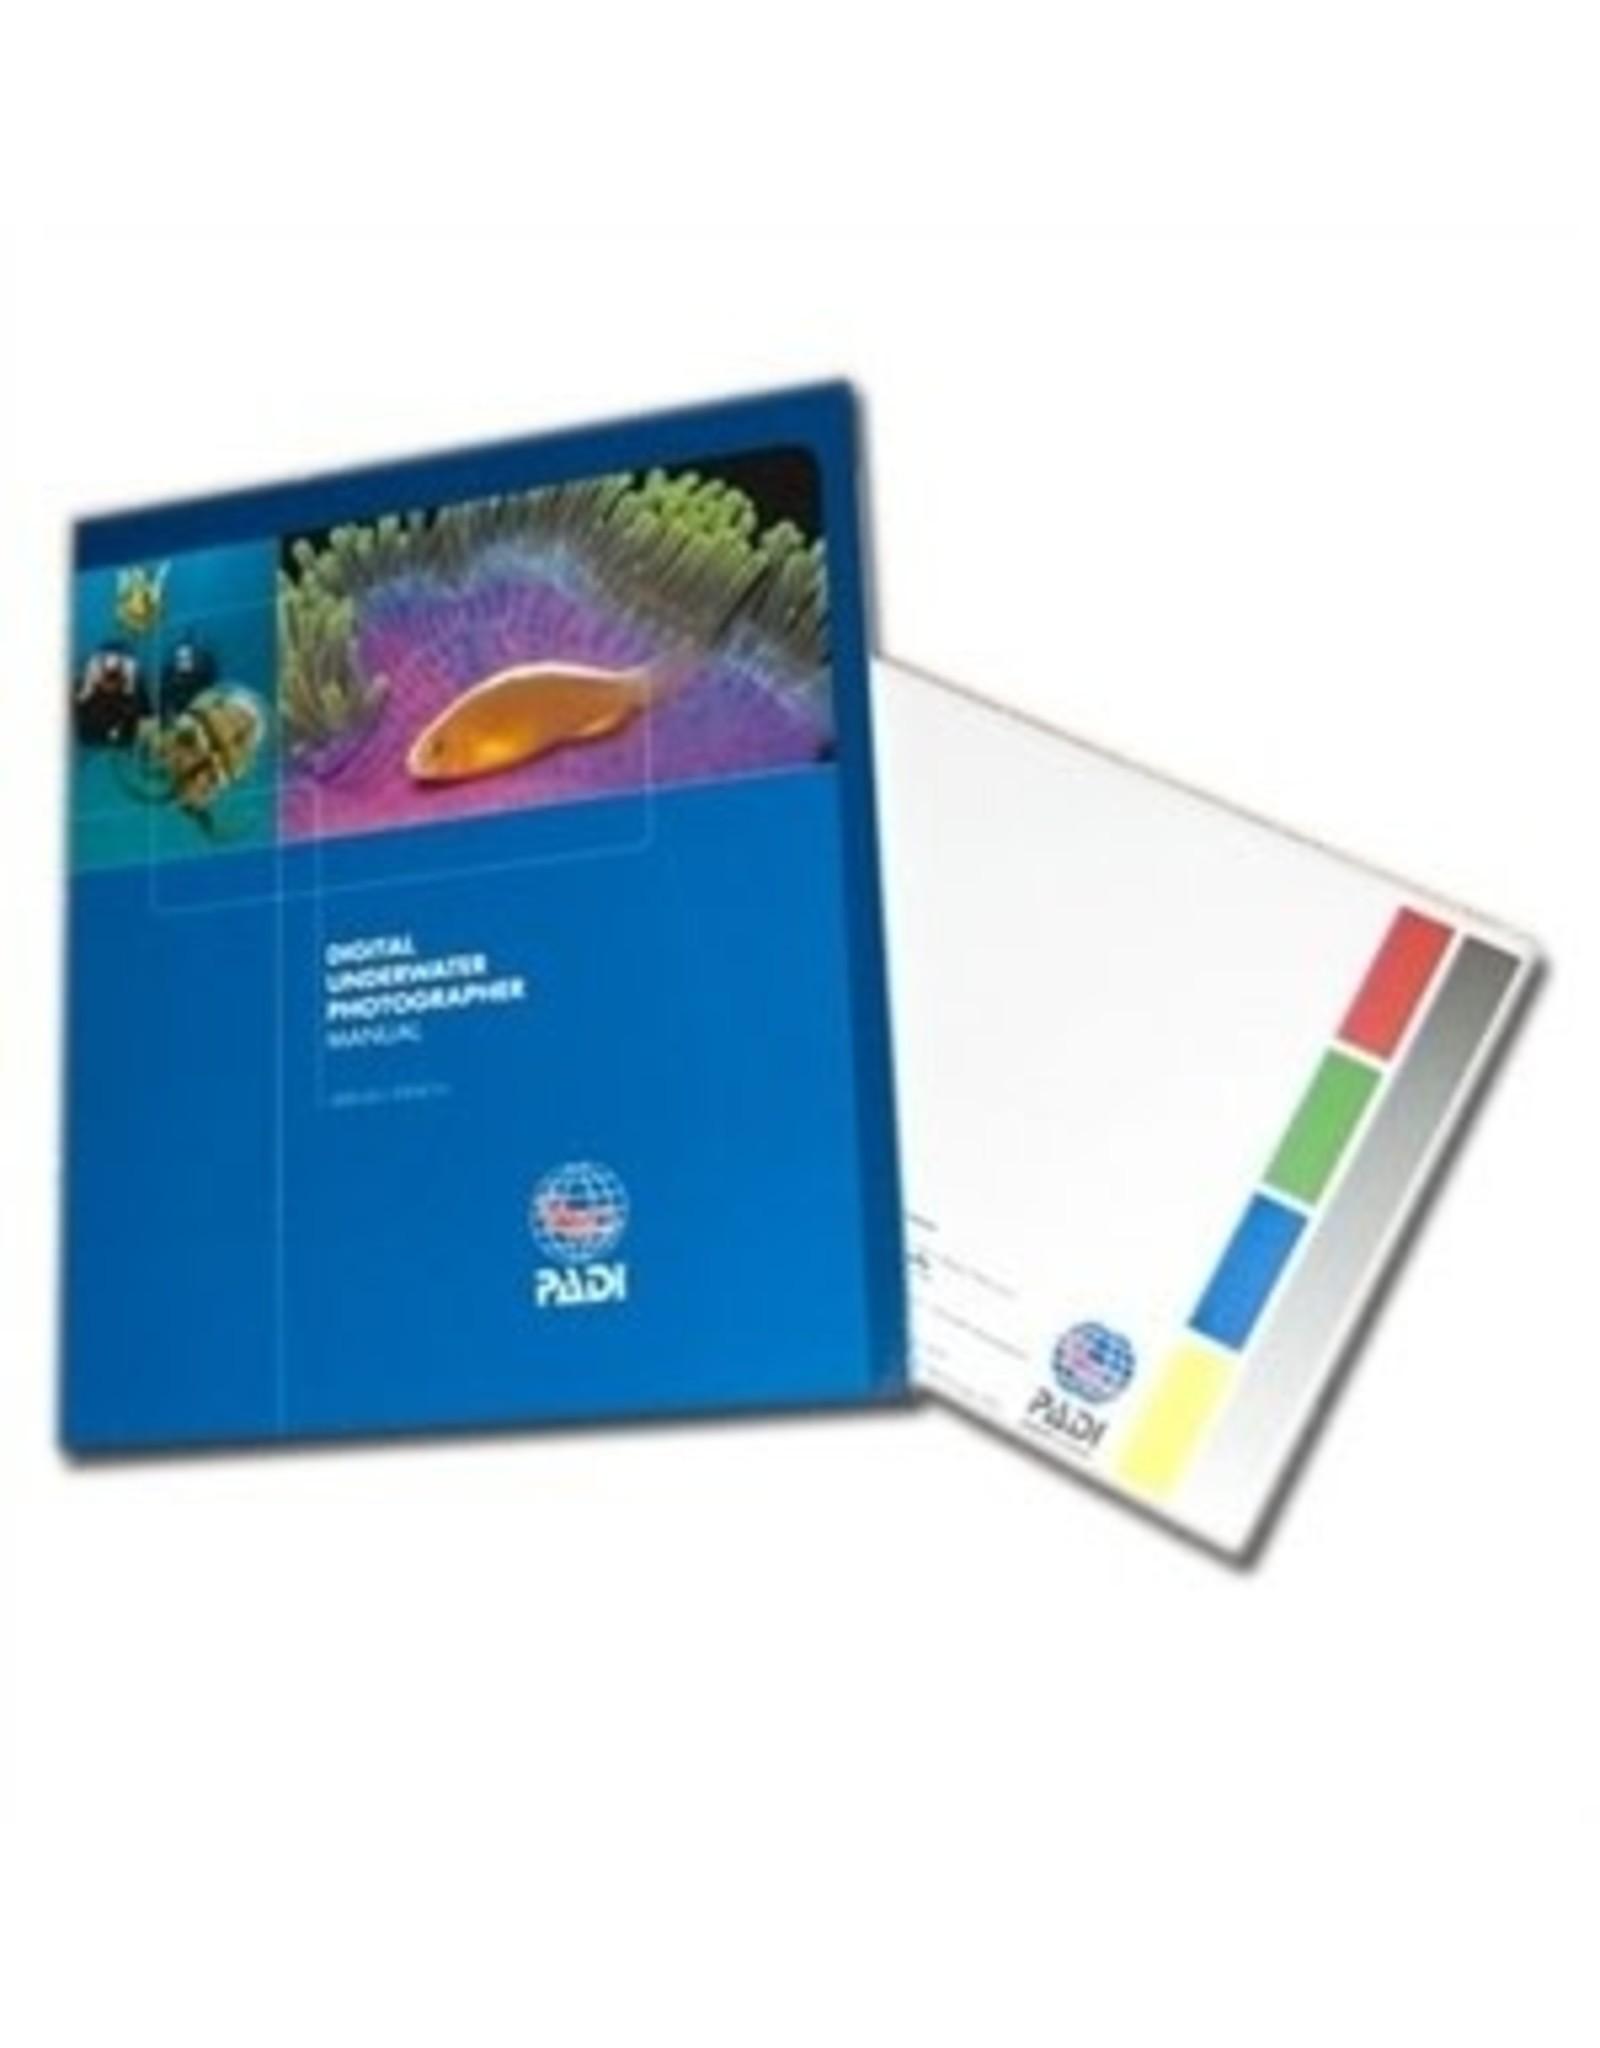 PADI PADI Pack - Digital Underwater Photographer Specialty